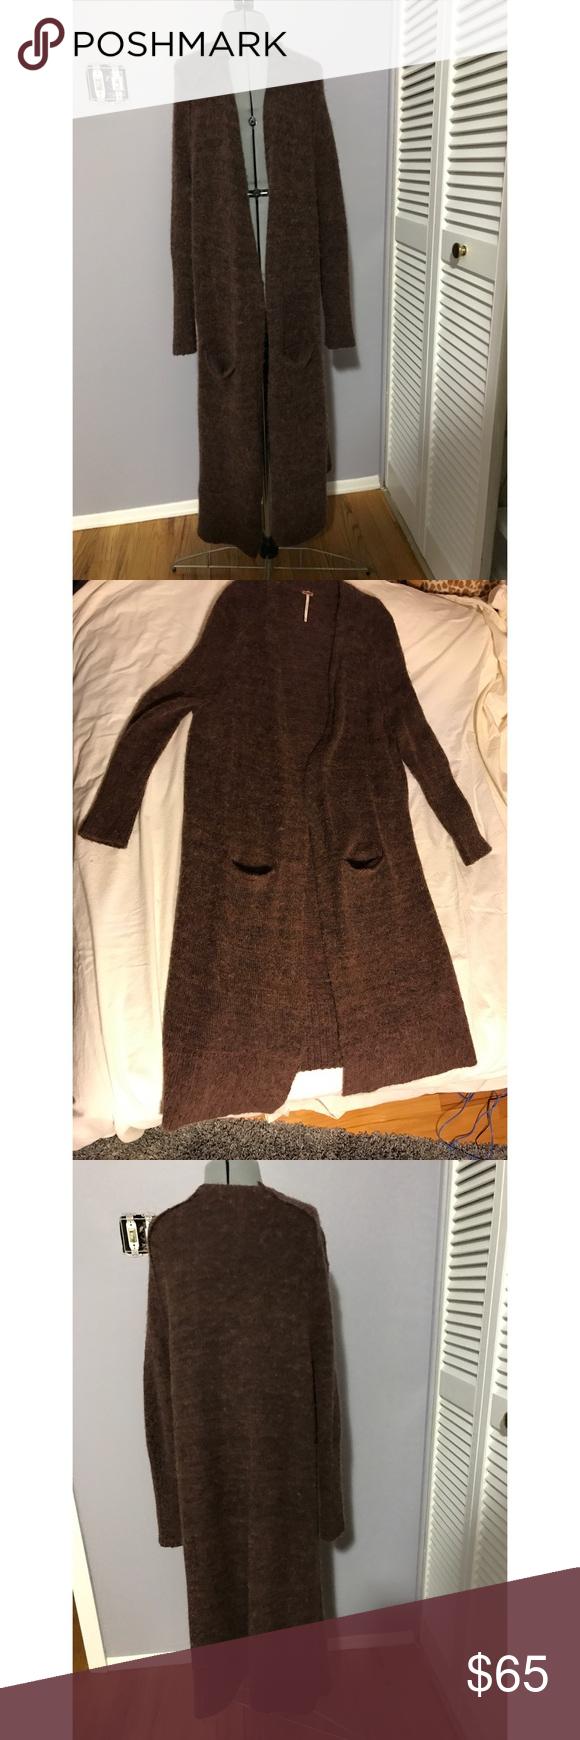 Free People Long Brown Sweater Cardigan Coat